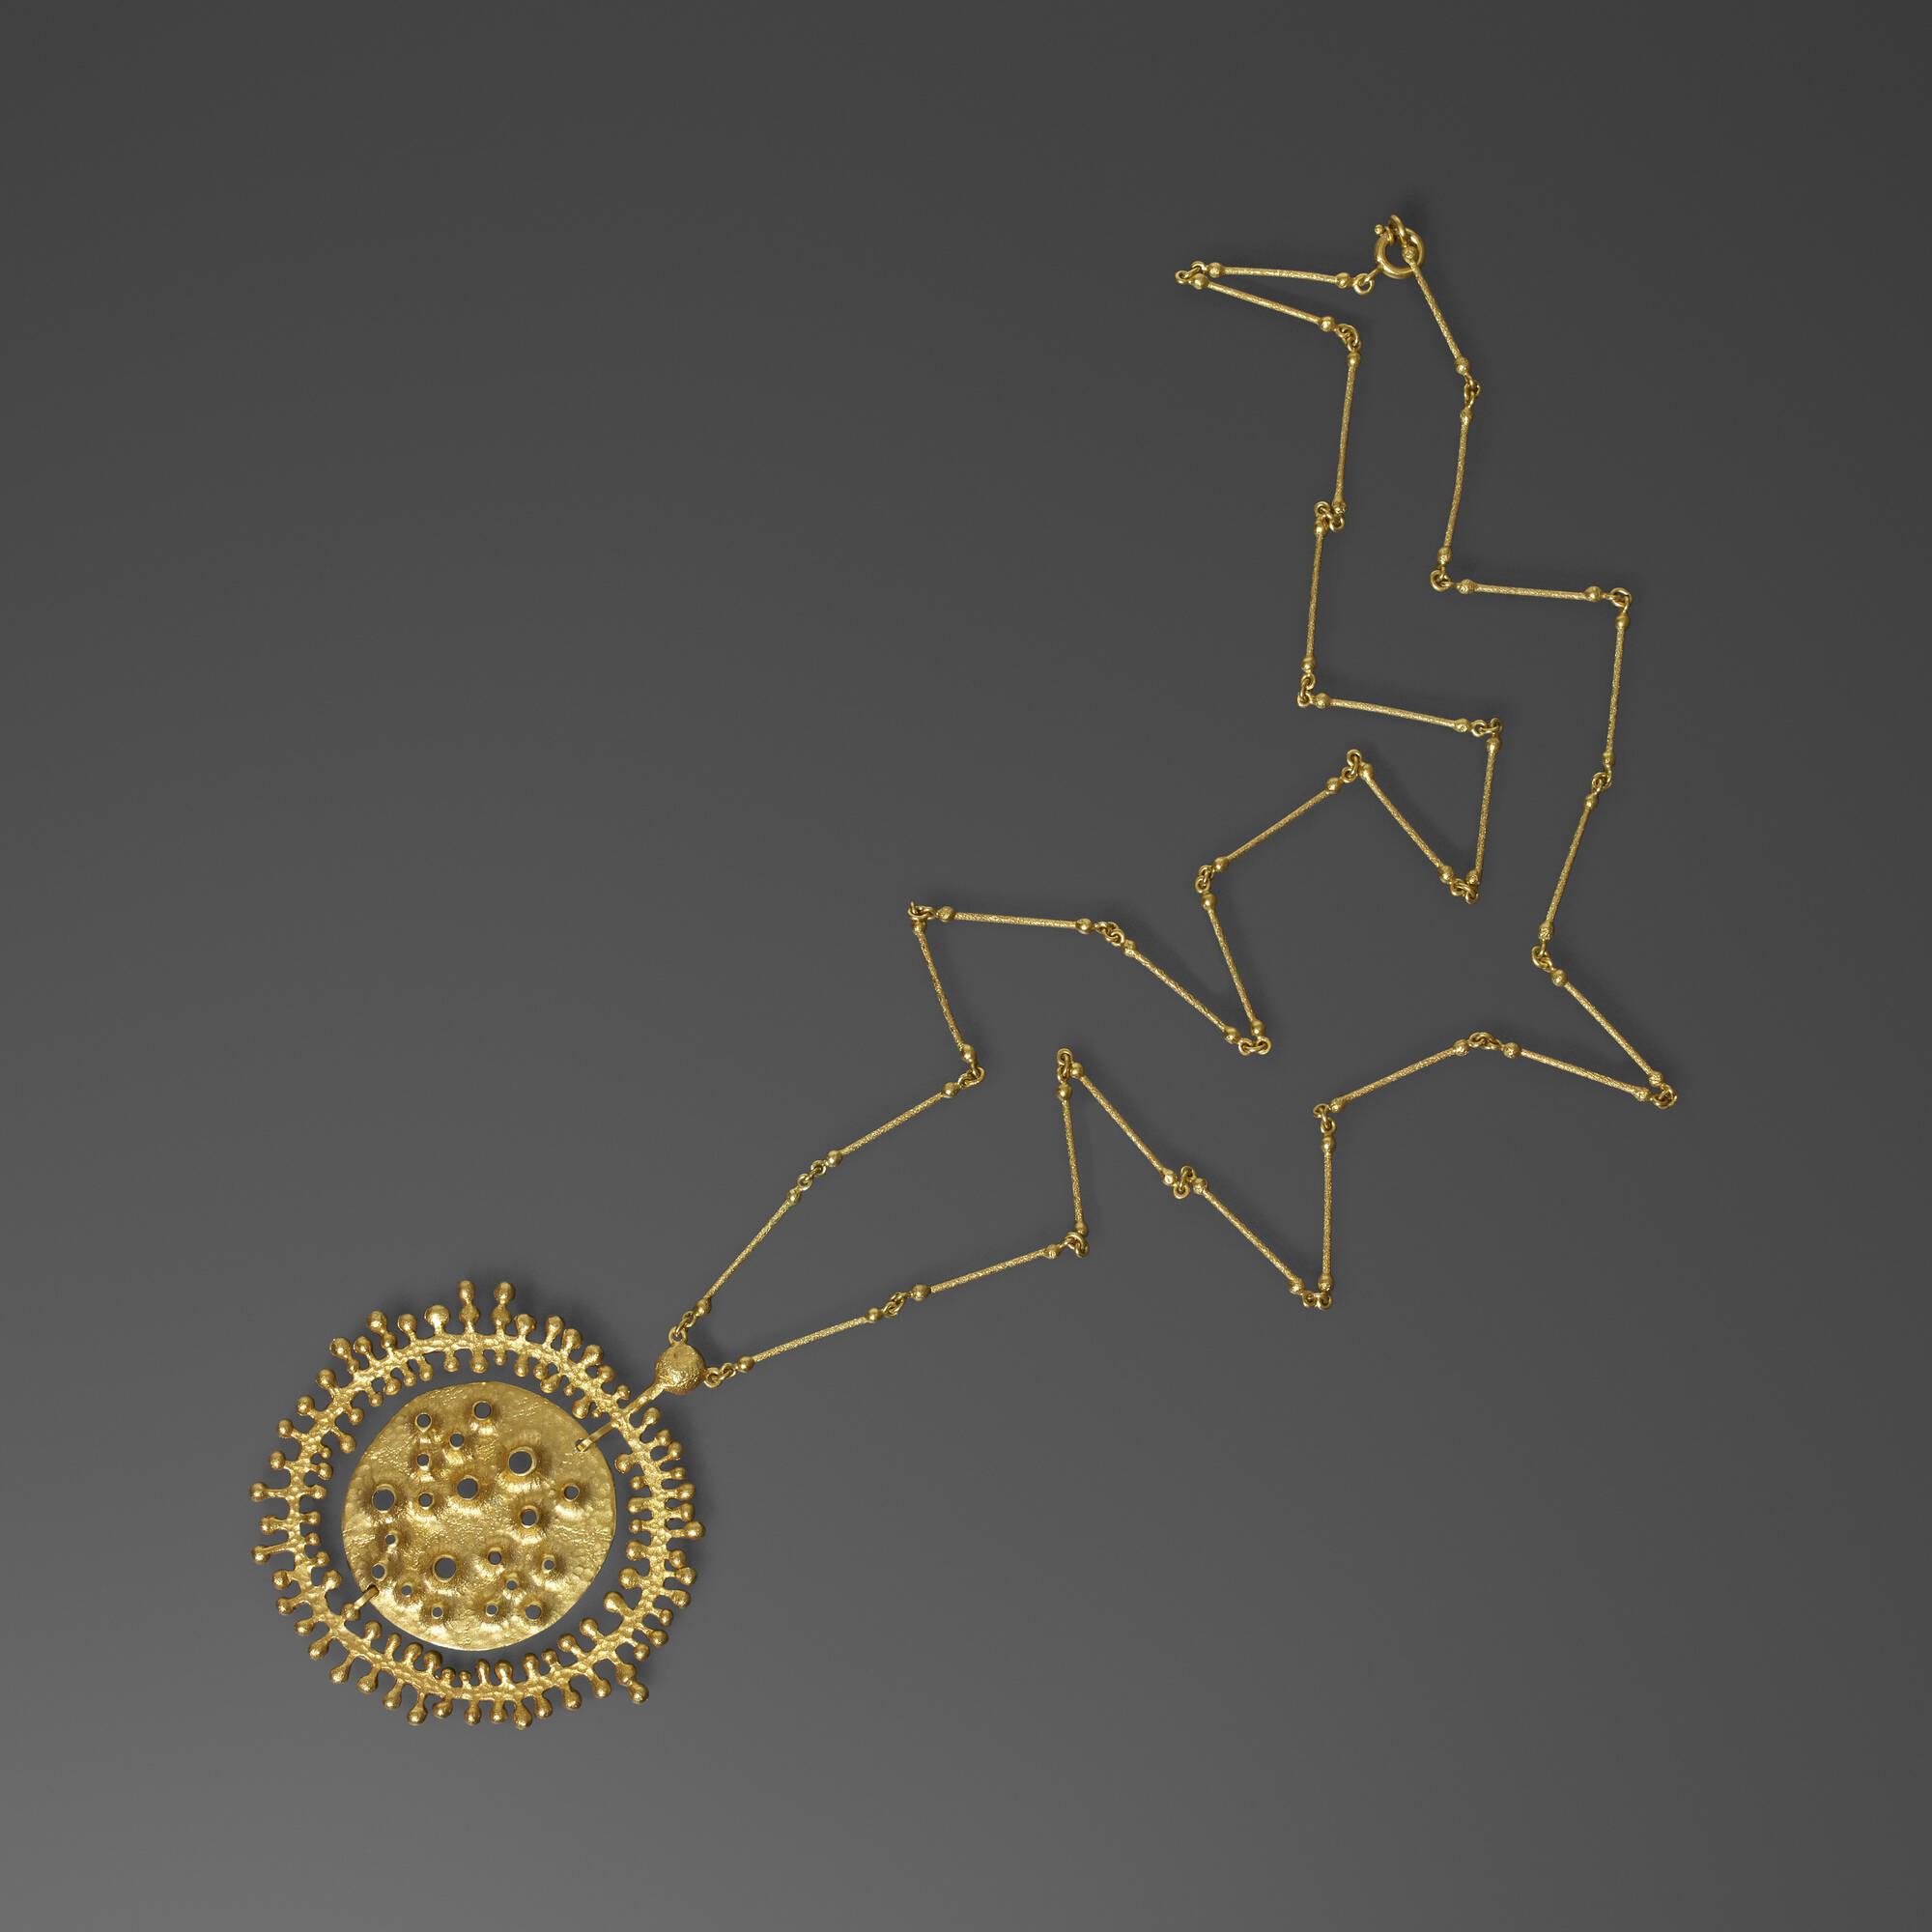 309: Tapio Wirkkala / Moon Landscape necklace (1 of 1)